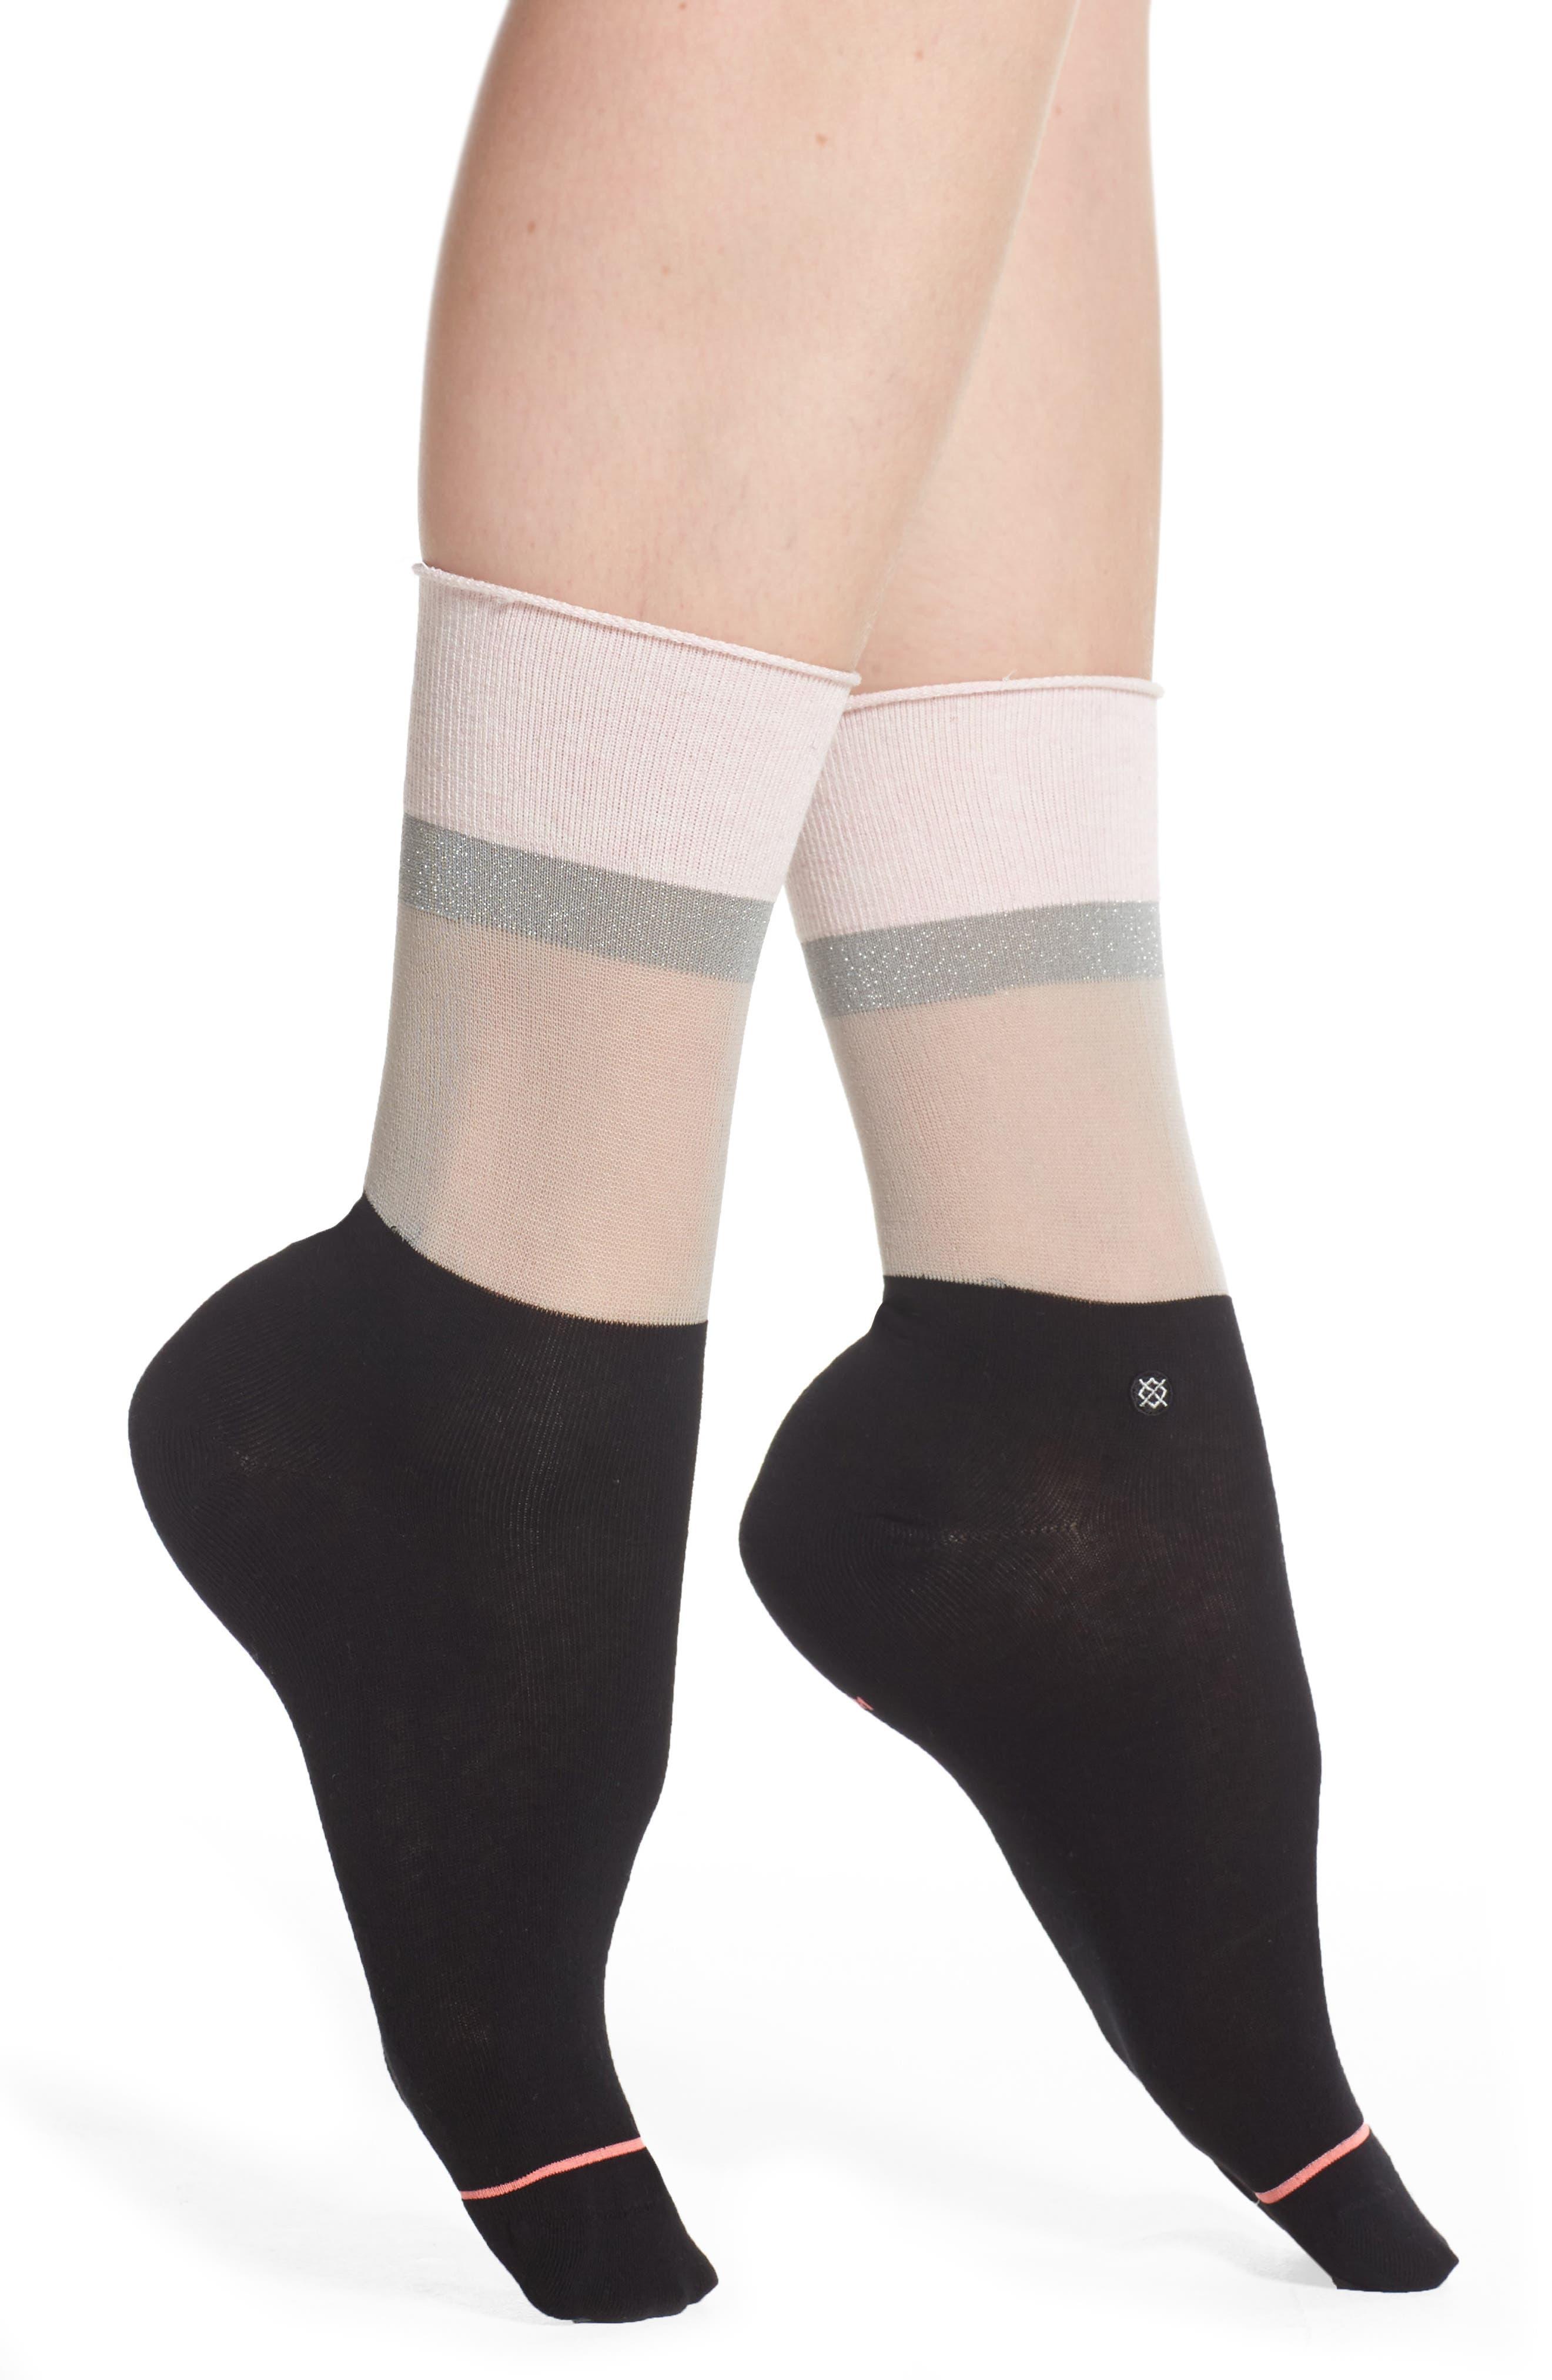 Alternate Image 1 Selected - Stance Cara Crew Socks